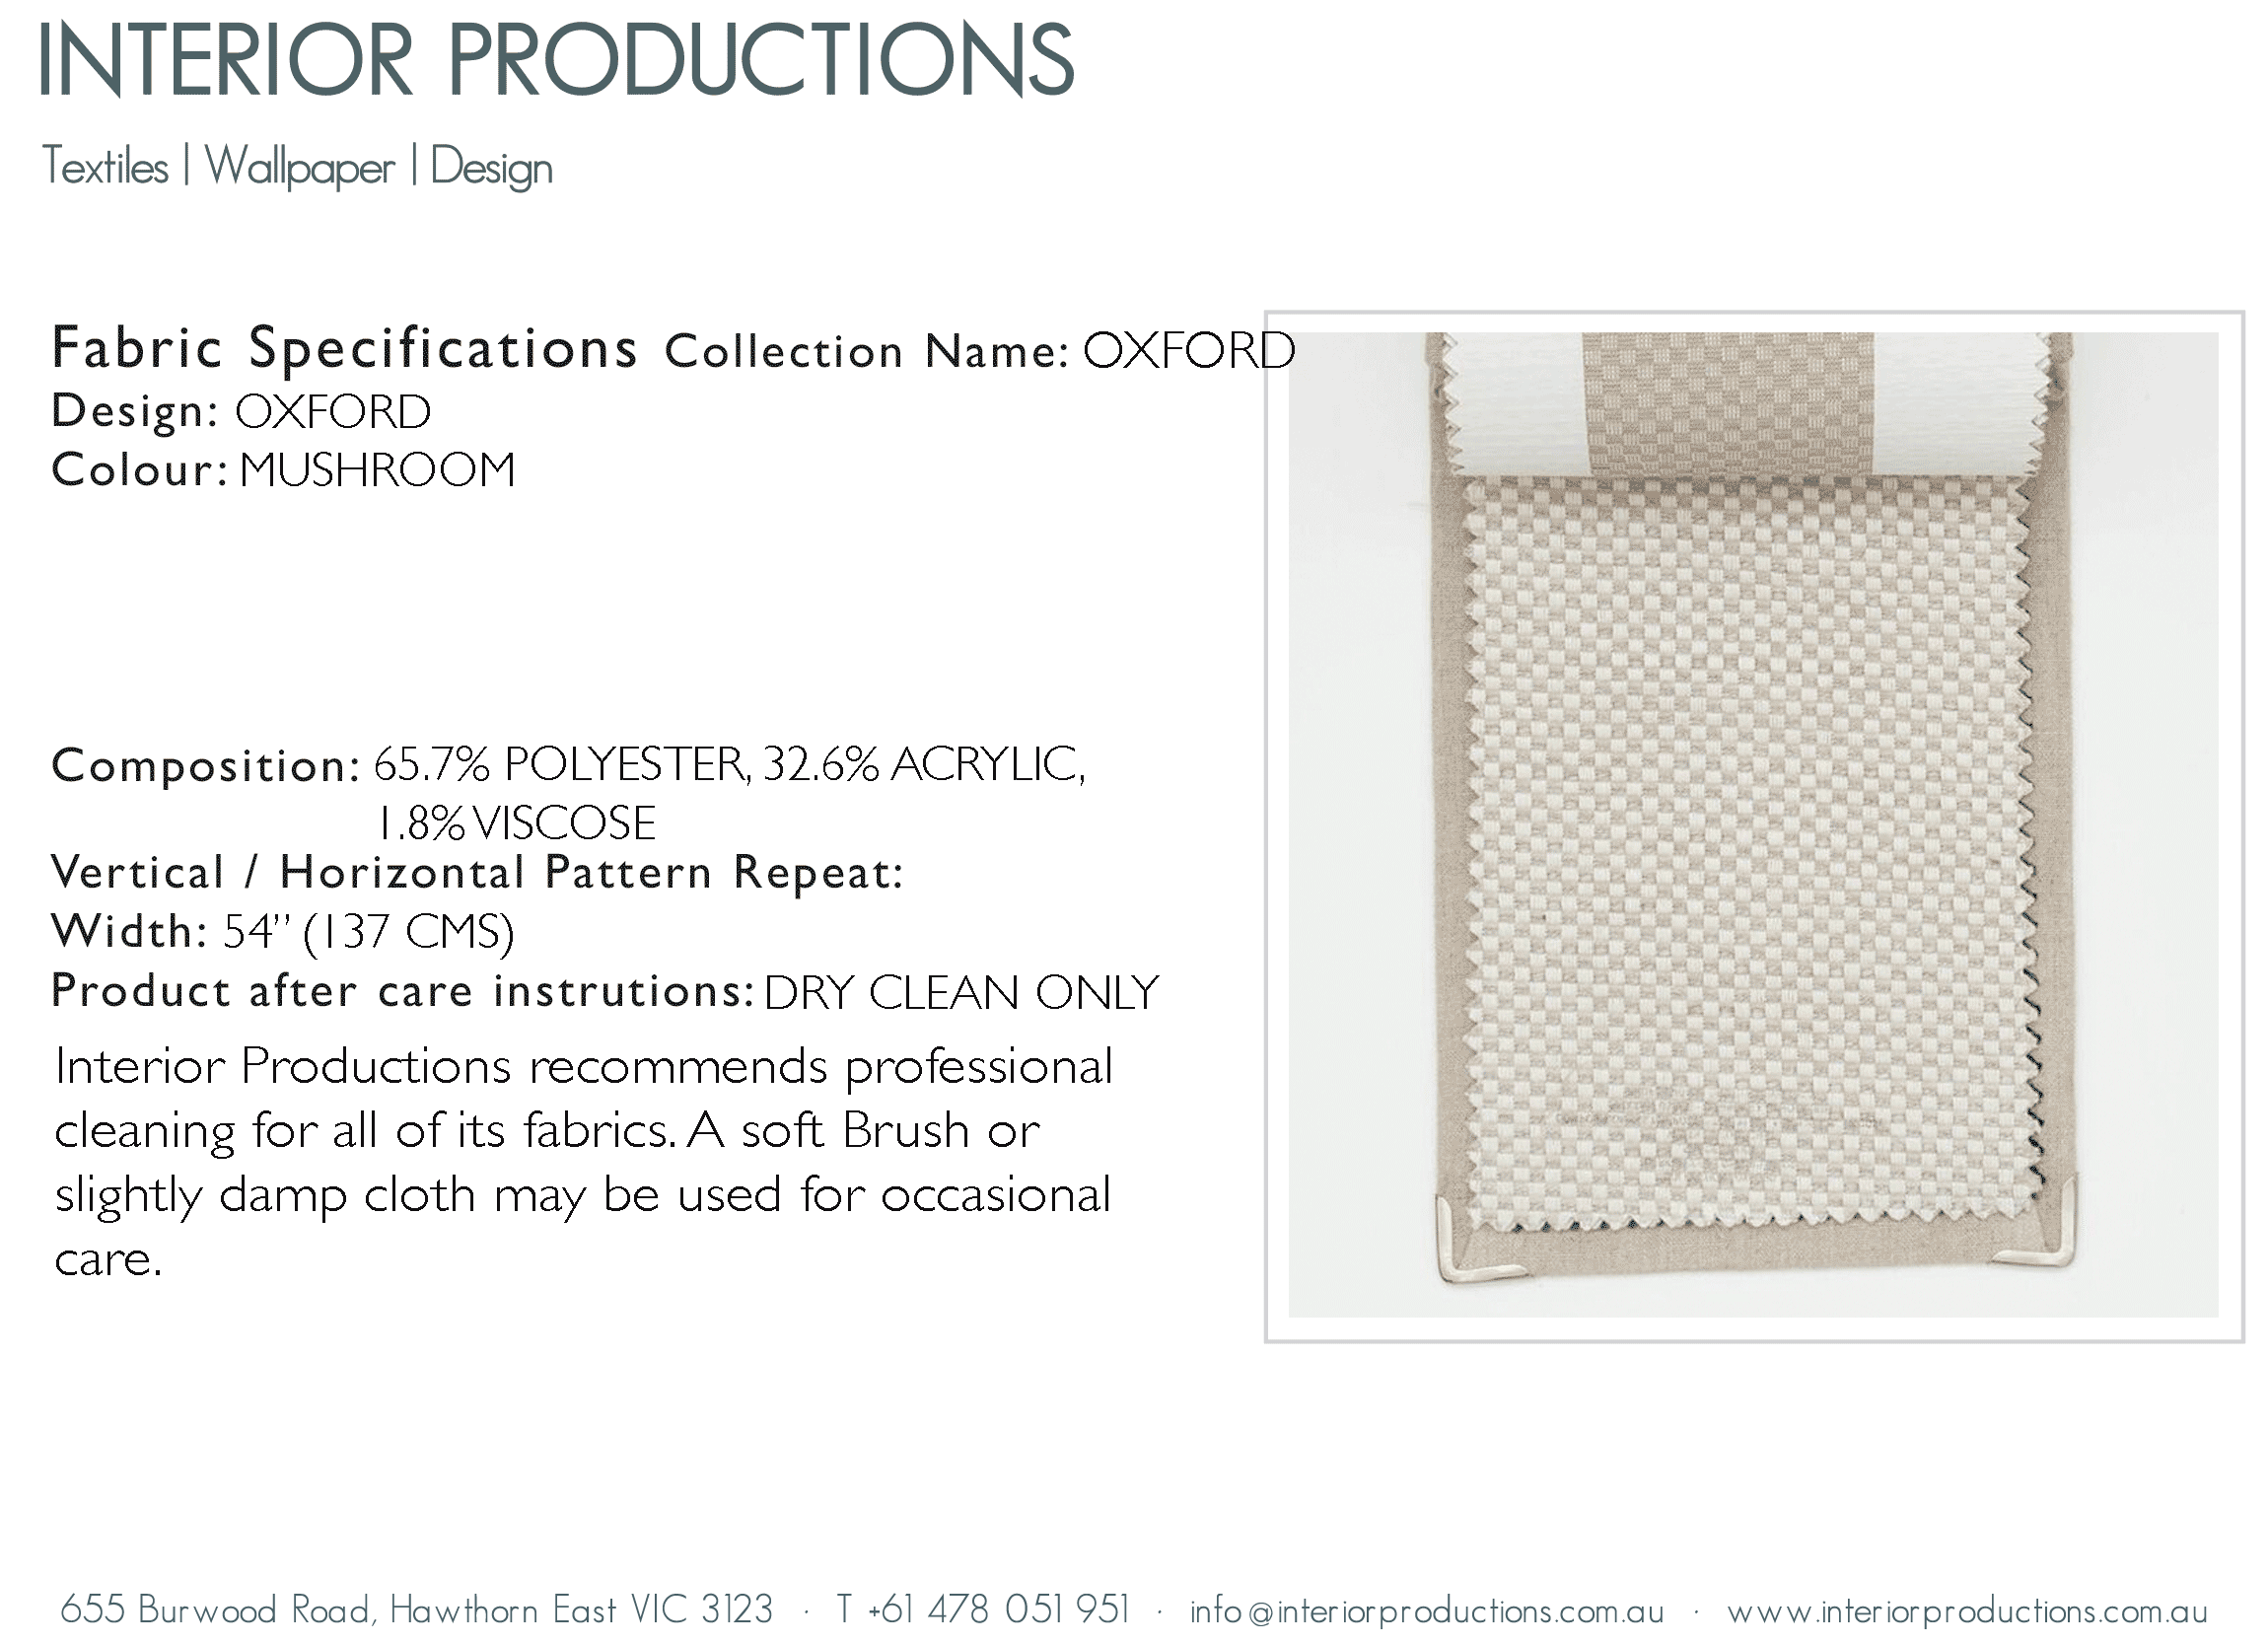 interior_productions_OXFORD---MUSHROOM